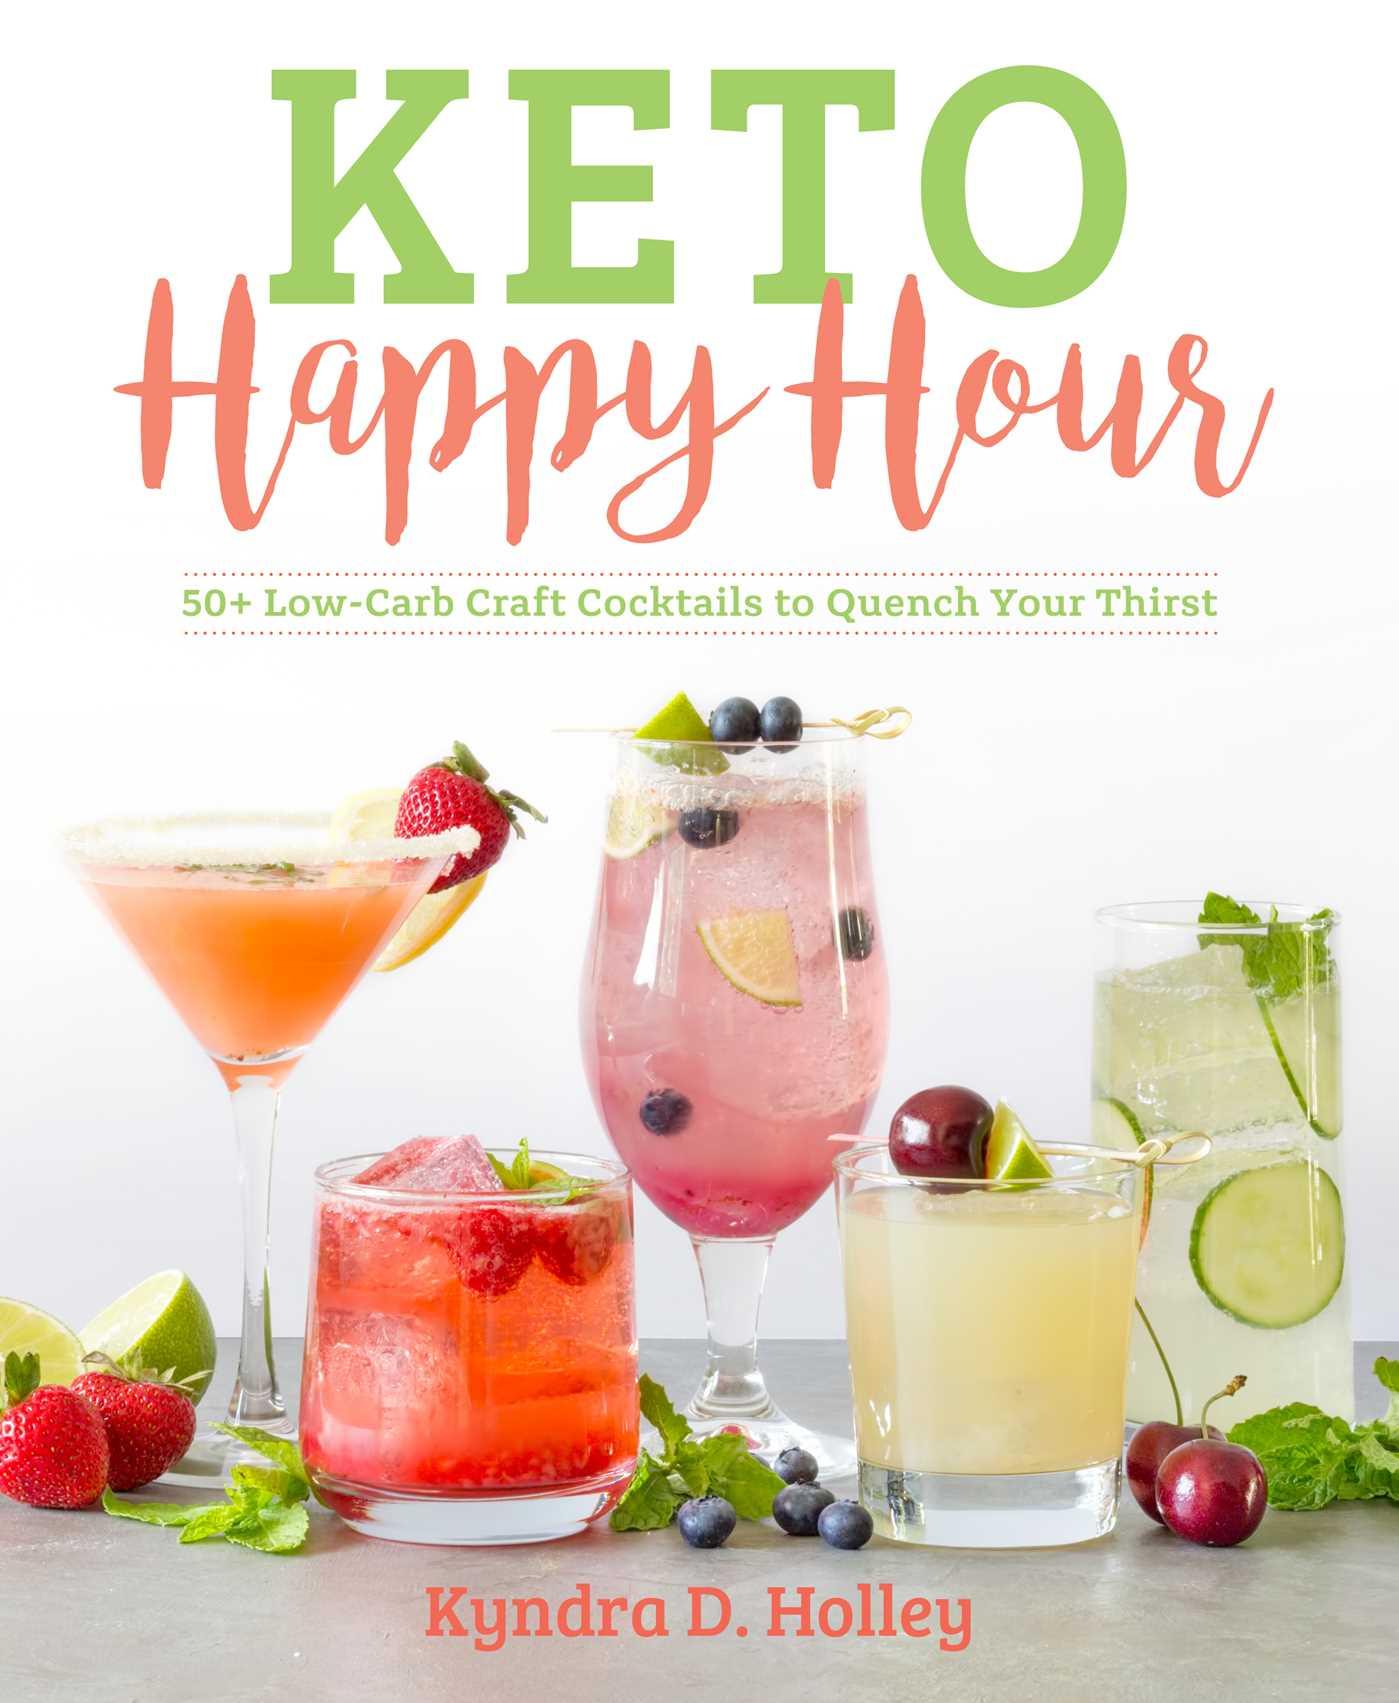 Keto happy hour 9781628602814 hr